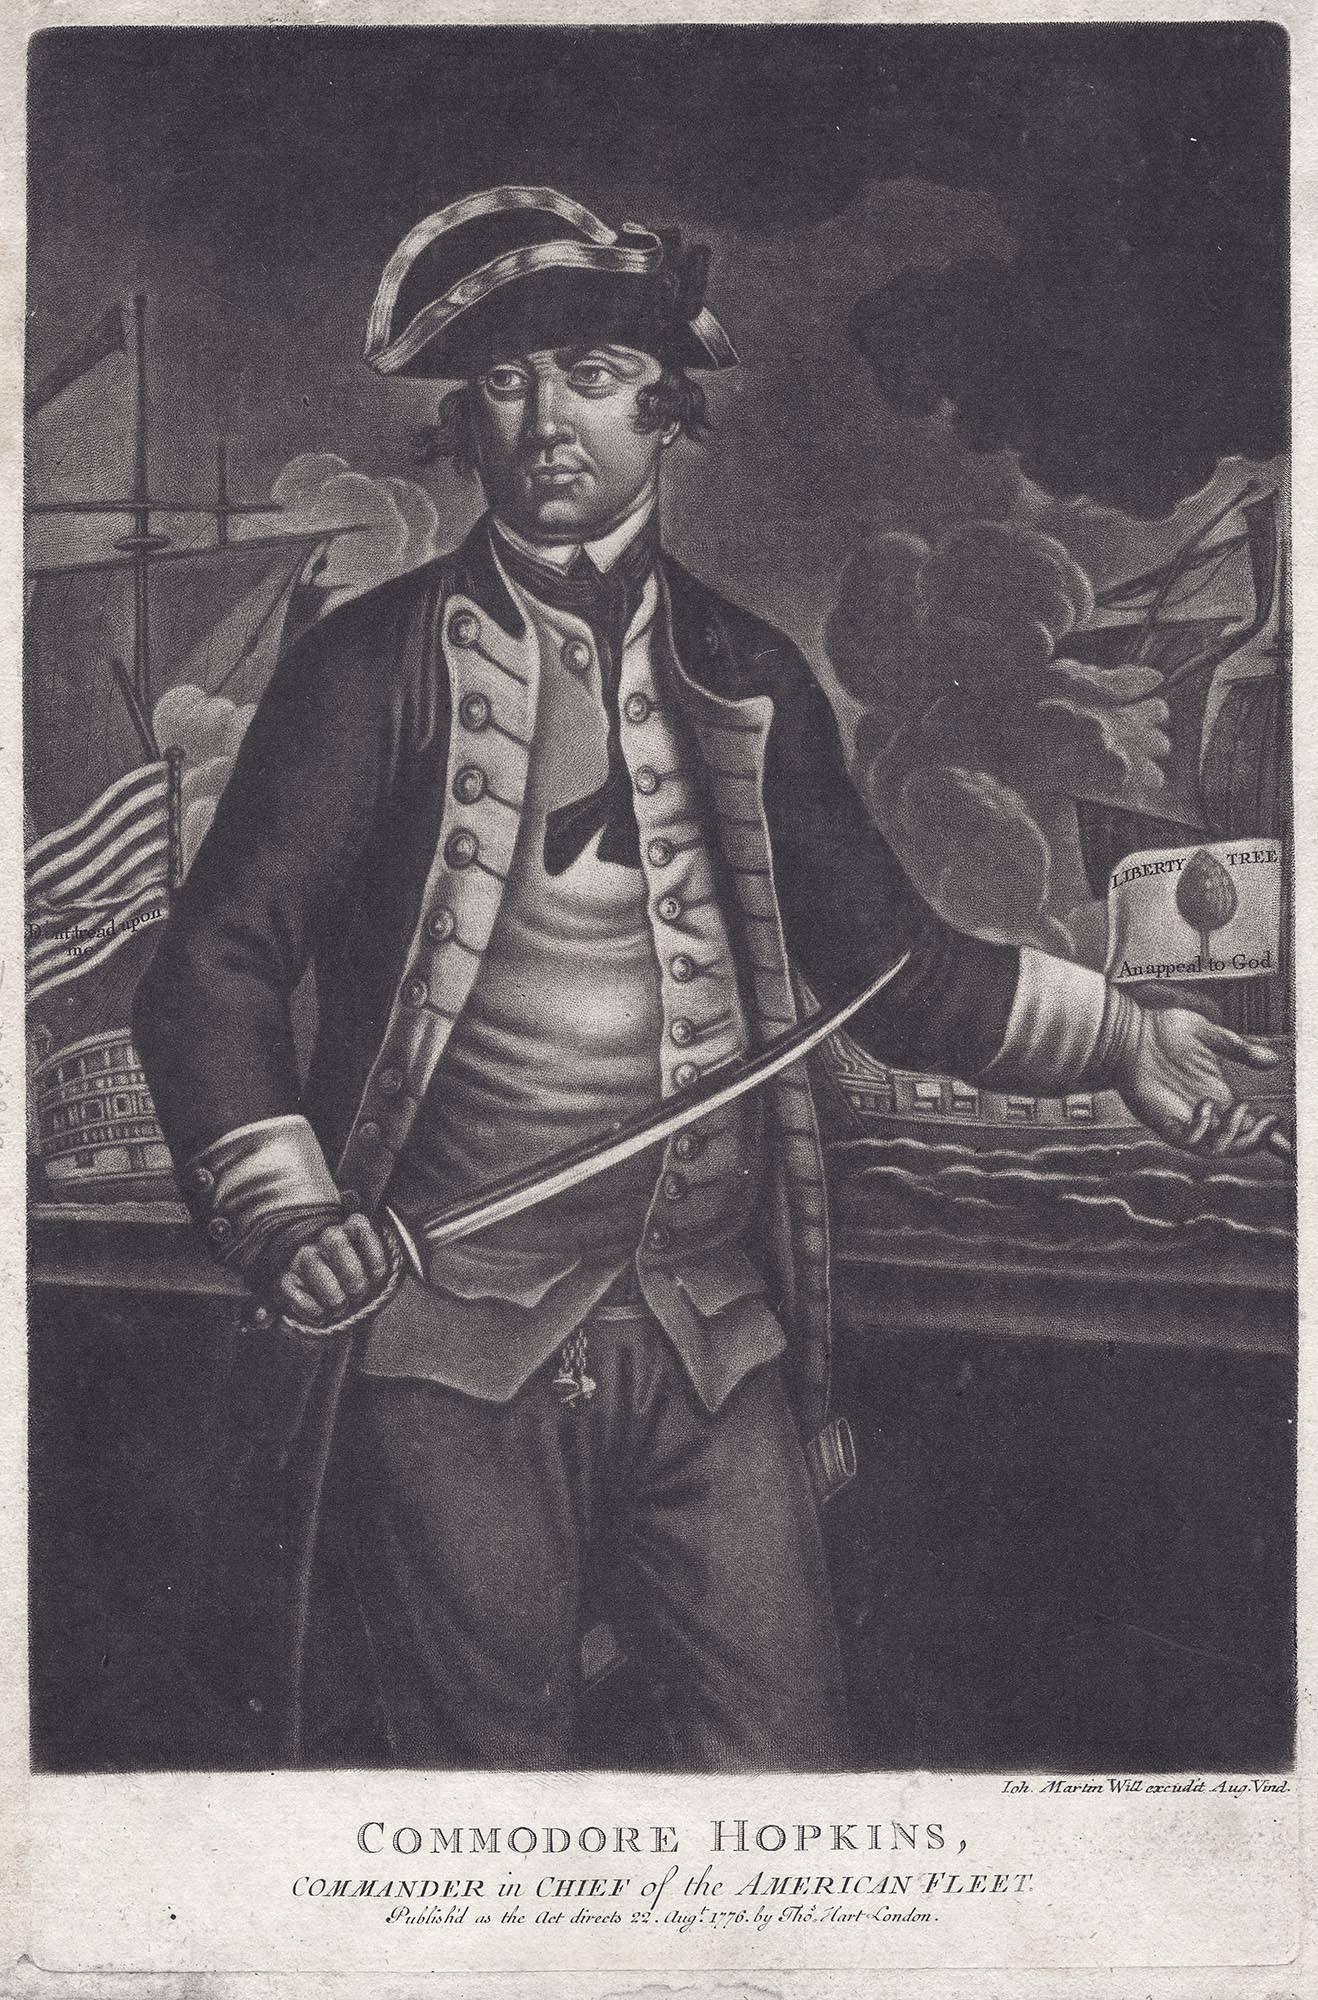 Commodore Hopkins, : Commander in Chief of the American Fleet.